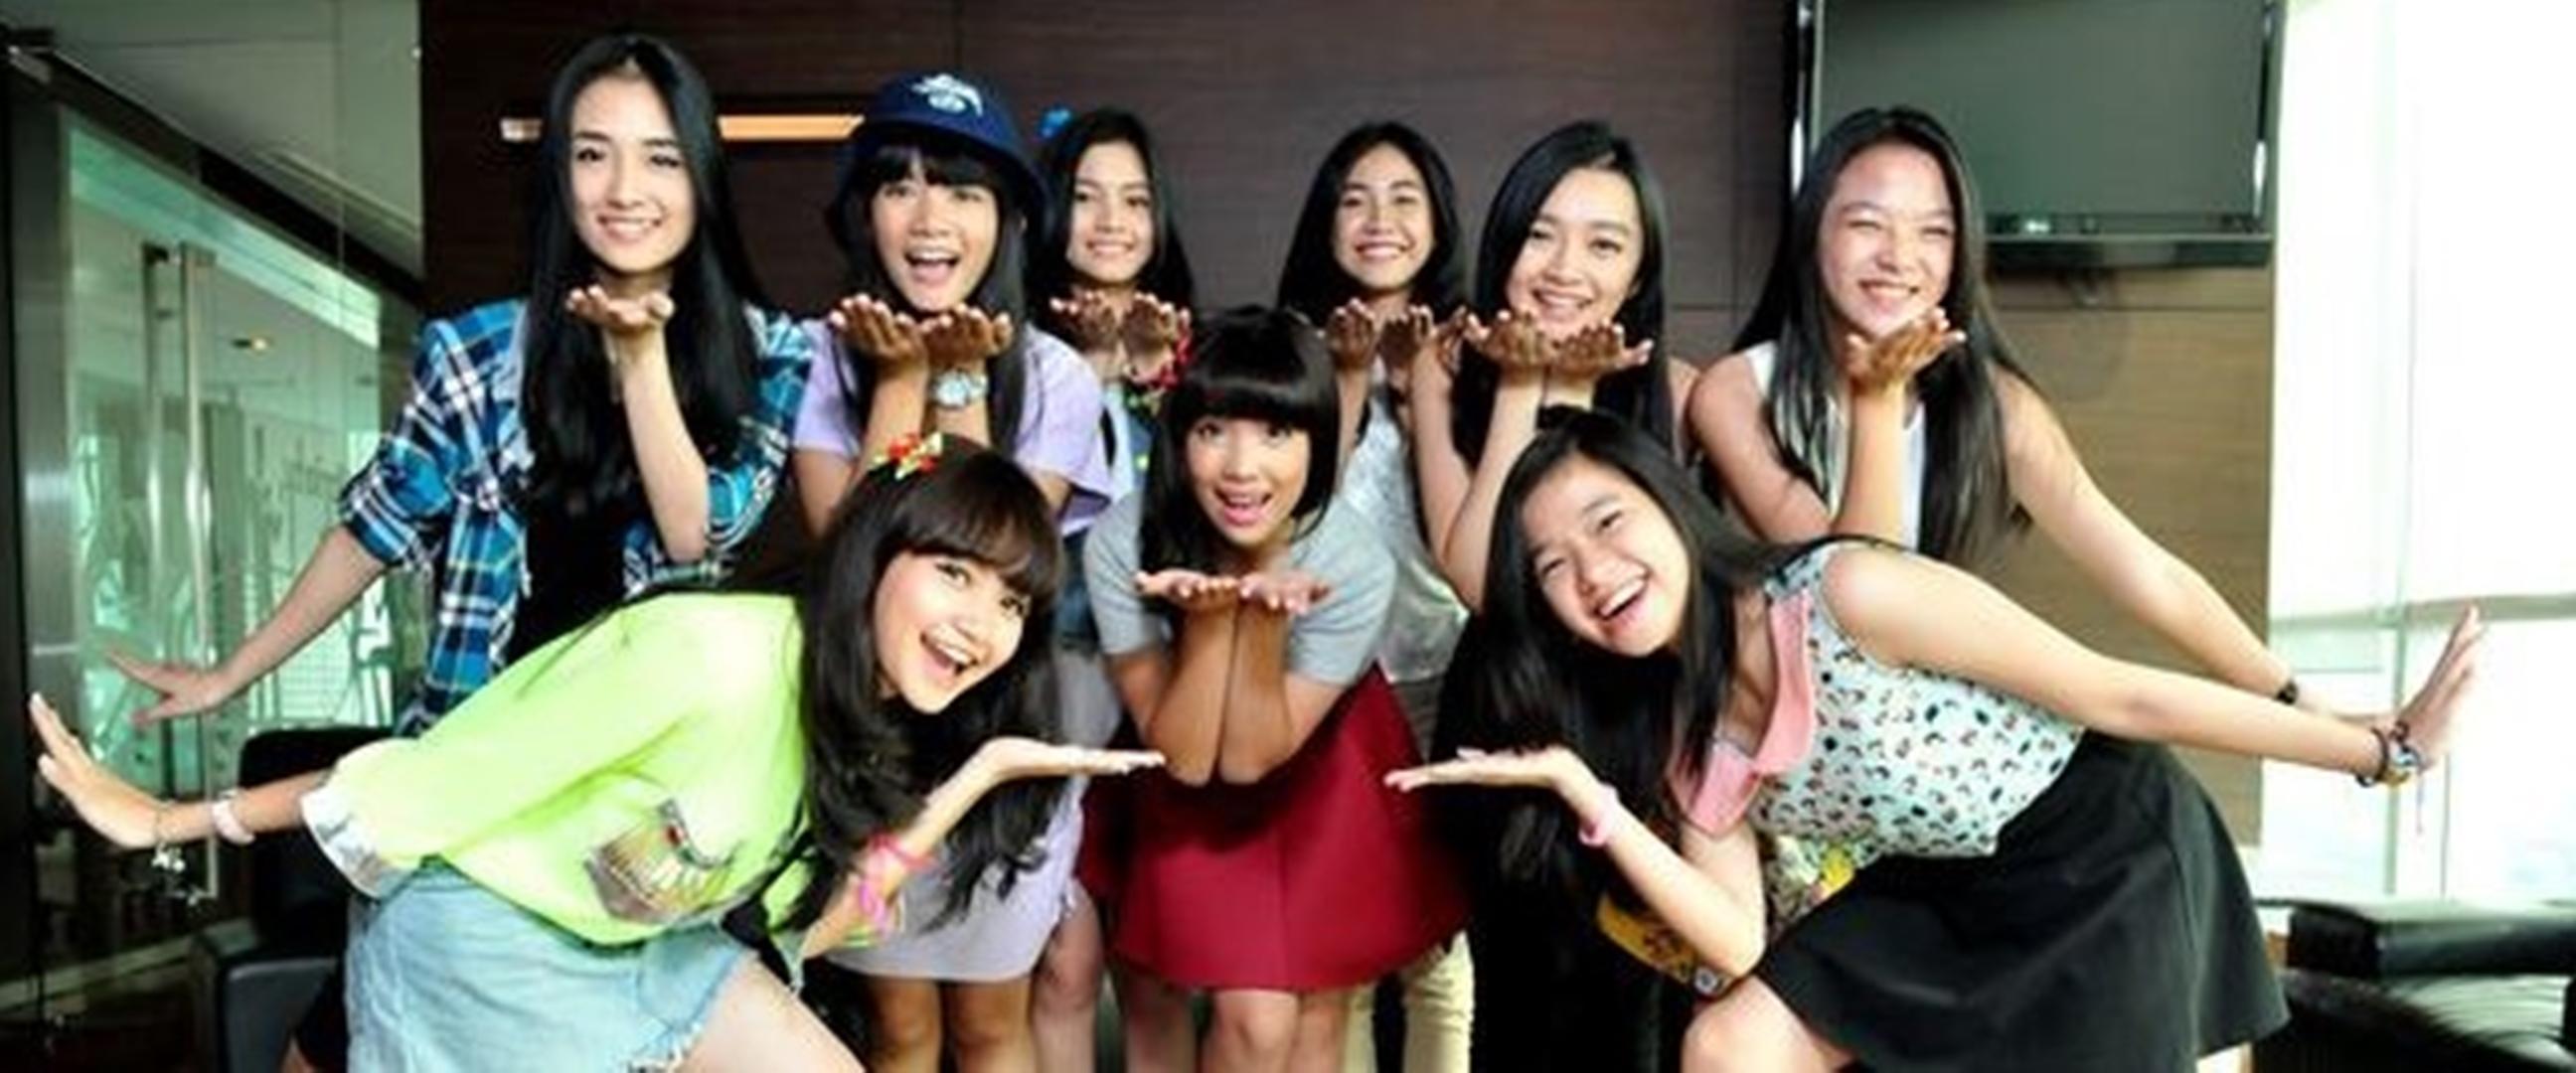 Ingat girlband Teenebelle? Begini potret terbaru 9 personelnya